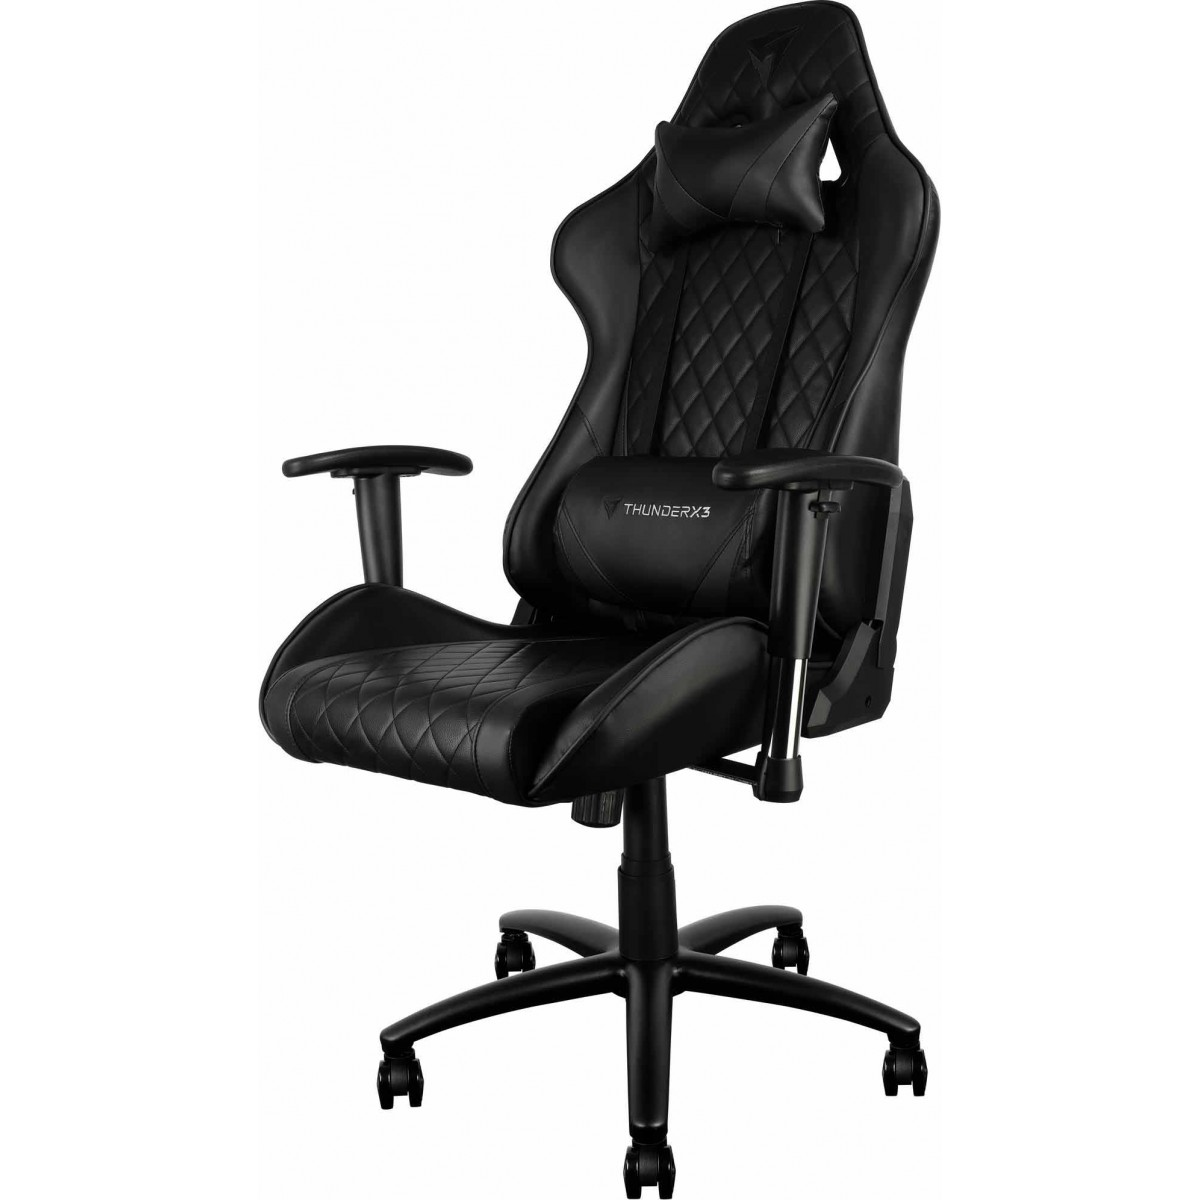 Cadeira Gamer ThunderX3, Black, TGC15-BK